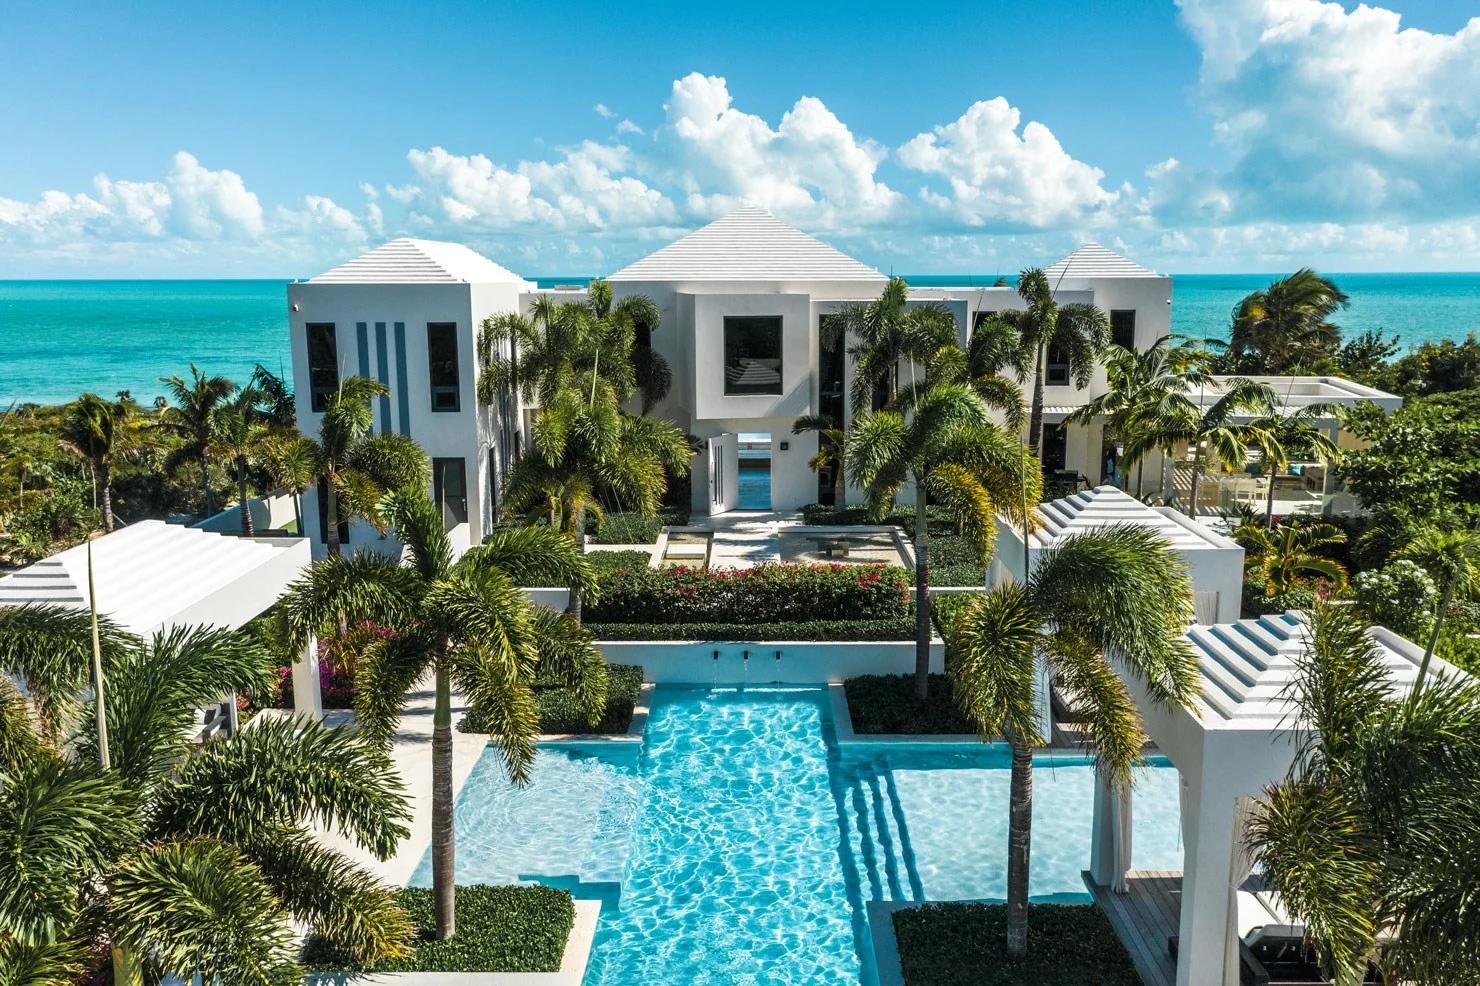 Triton, Turks & Caicos